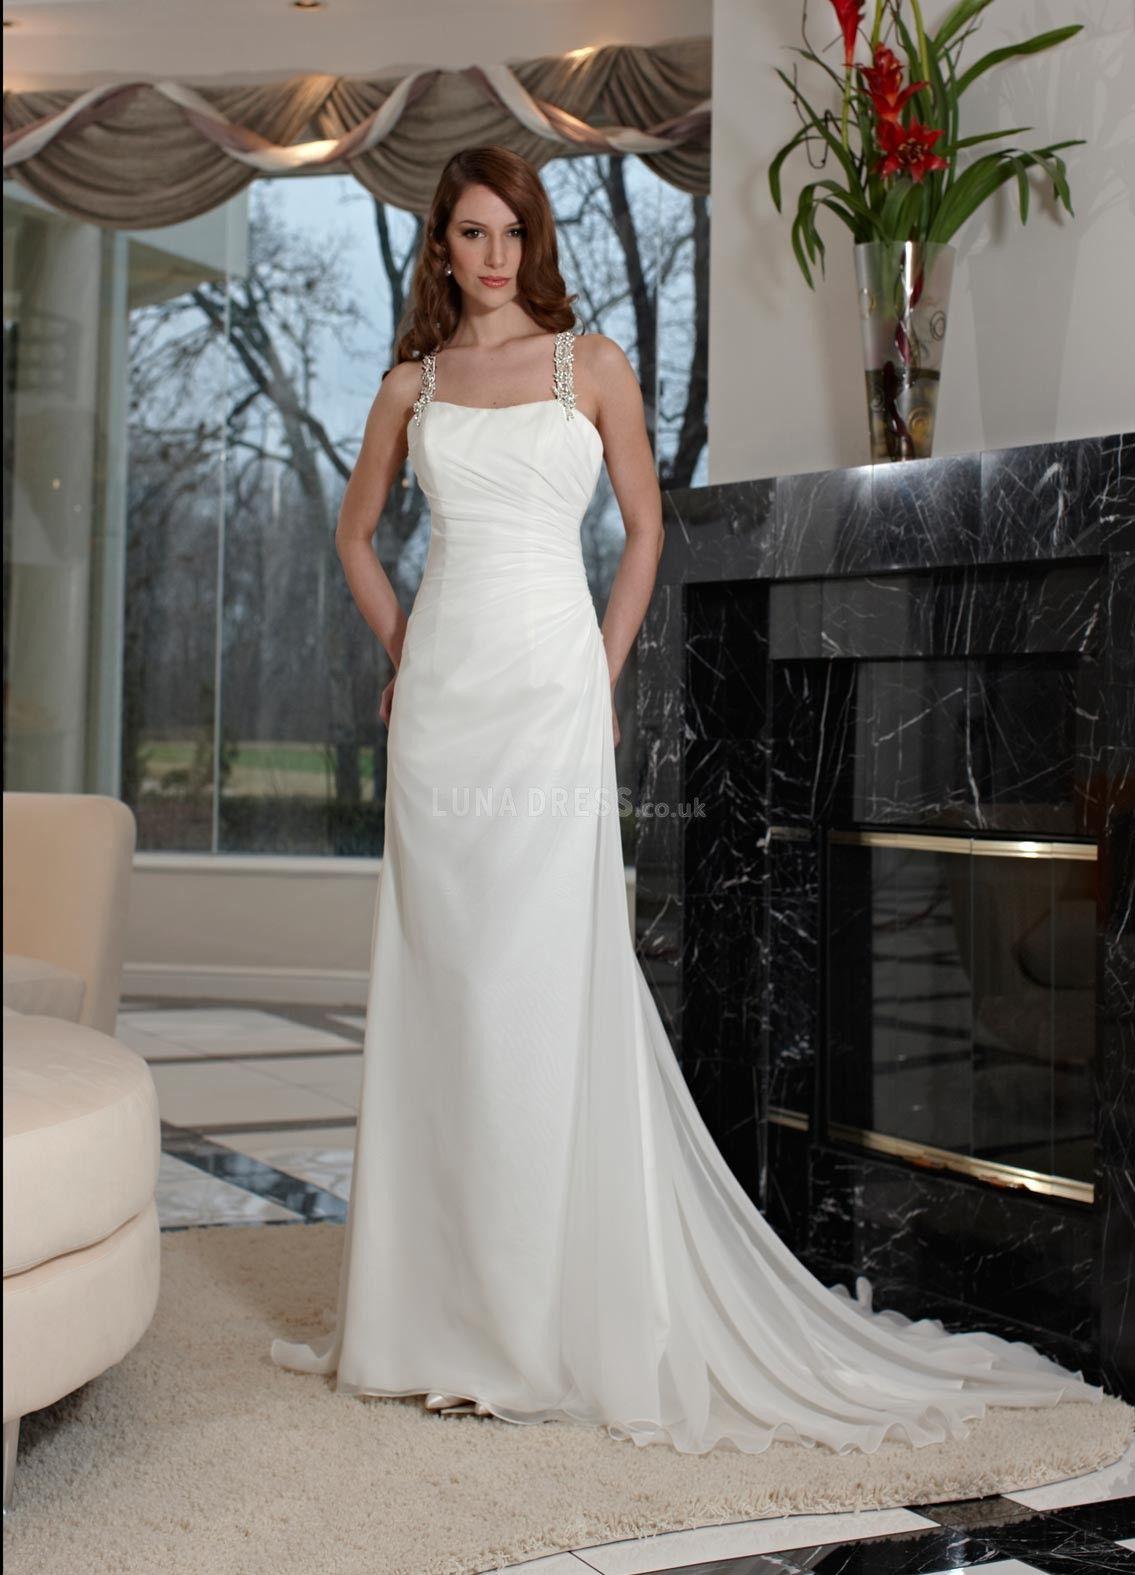 Wedding dress without train  chiffonsheathcolumnstrapssleevelessfloorlengthbeachwedding